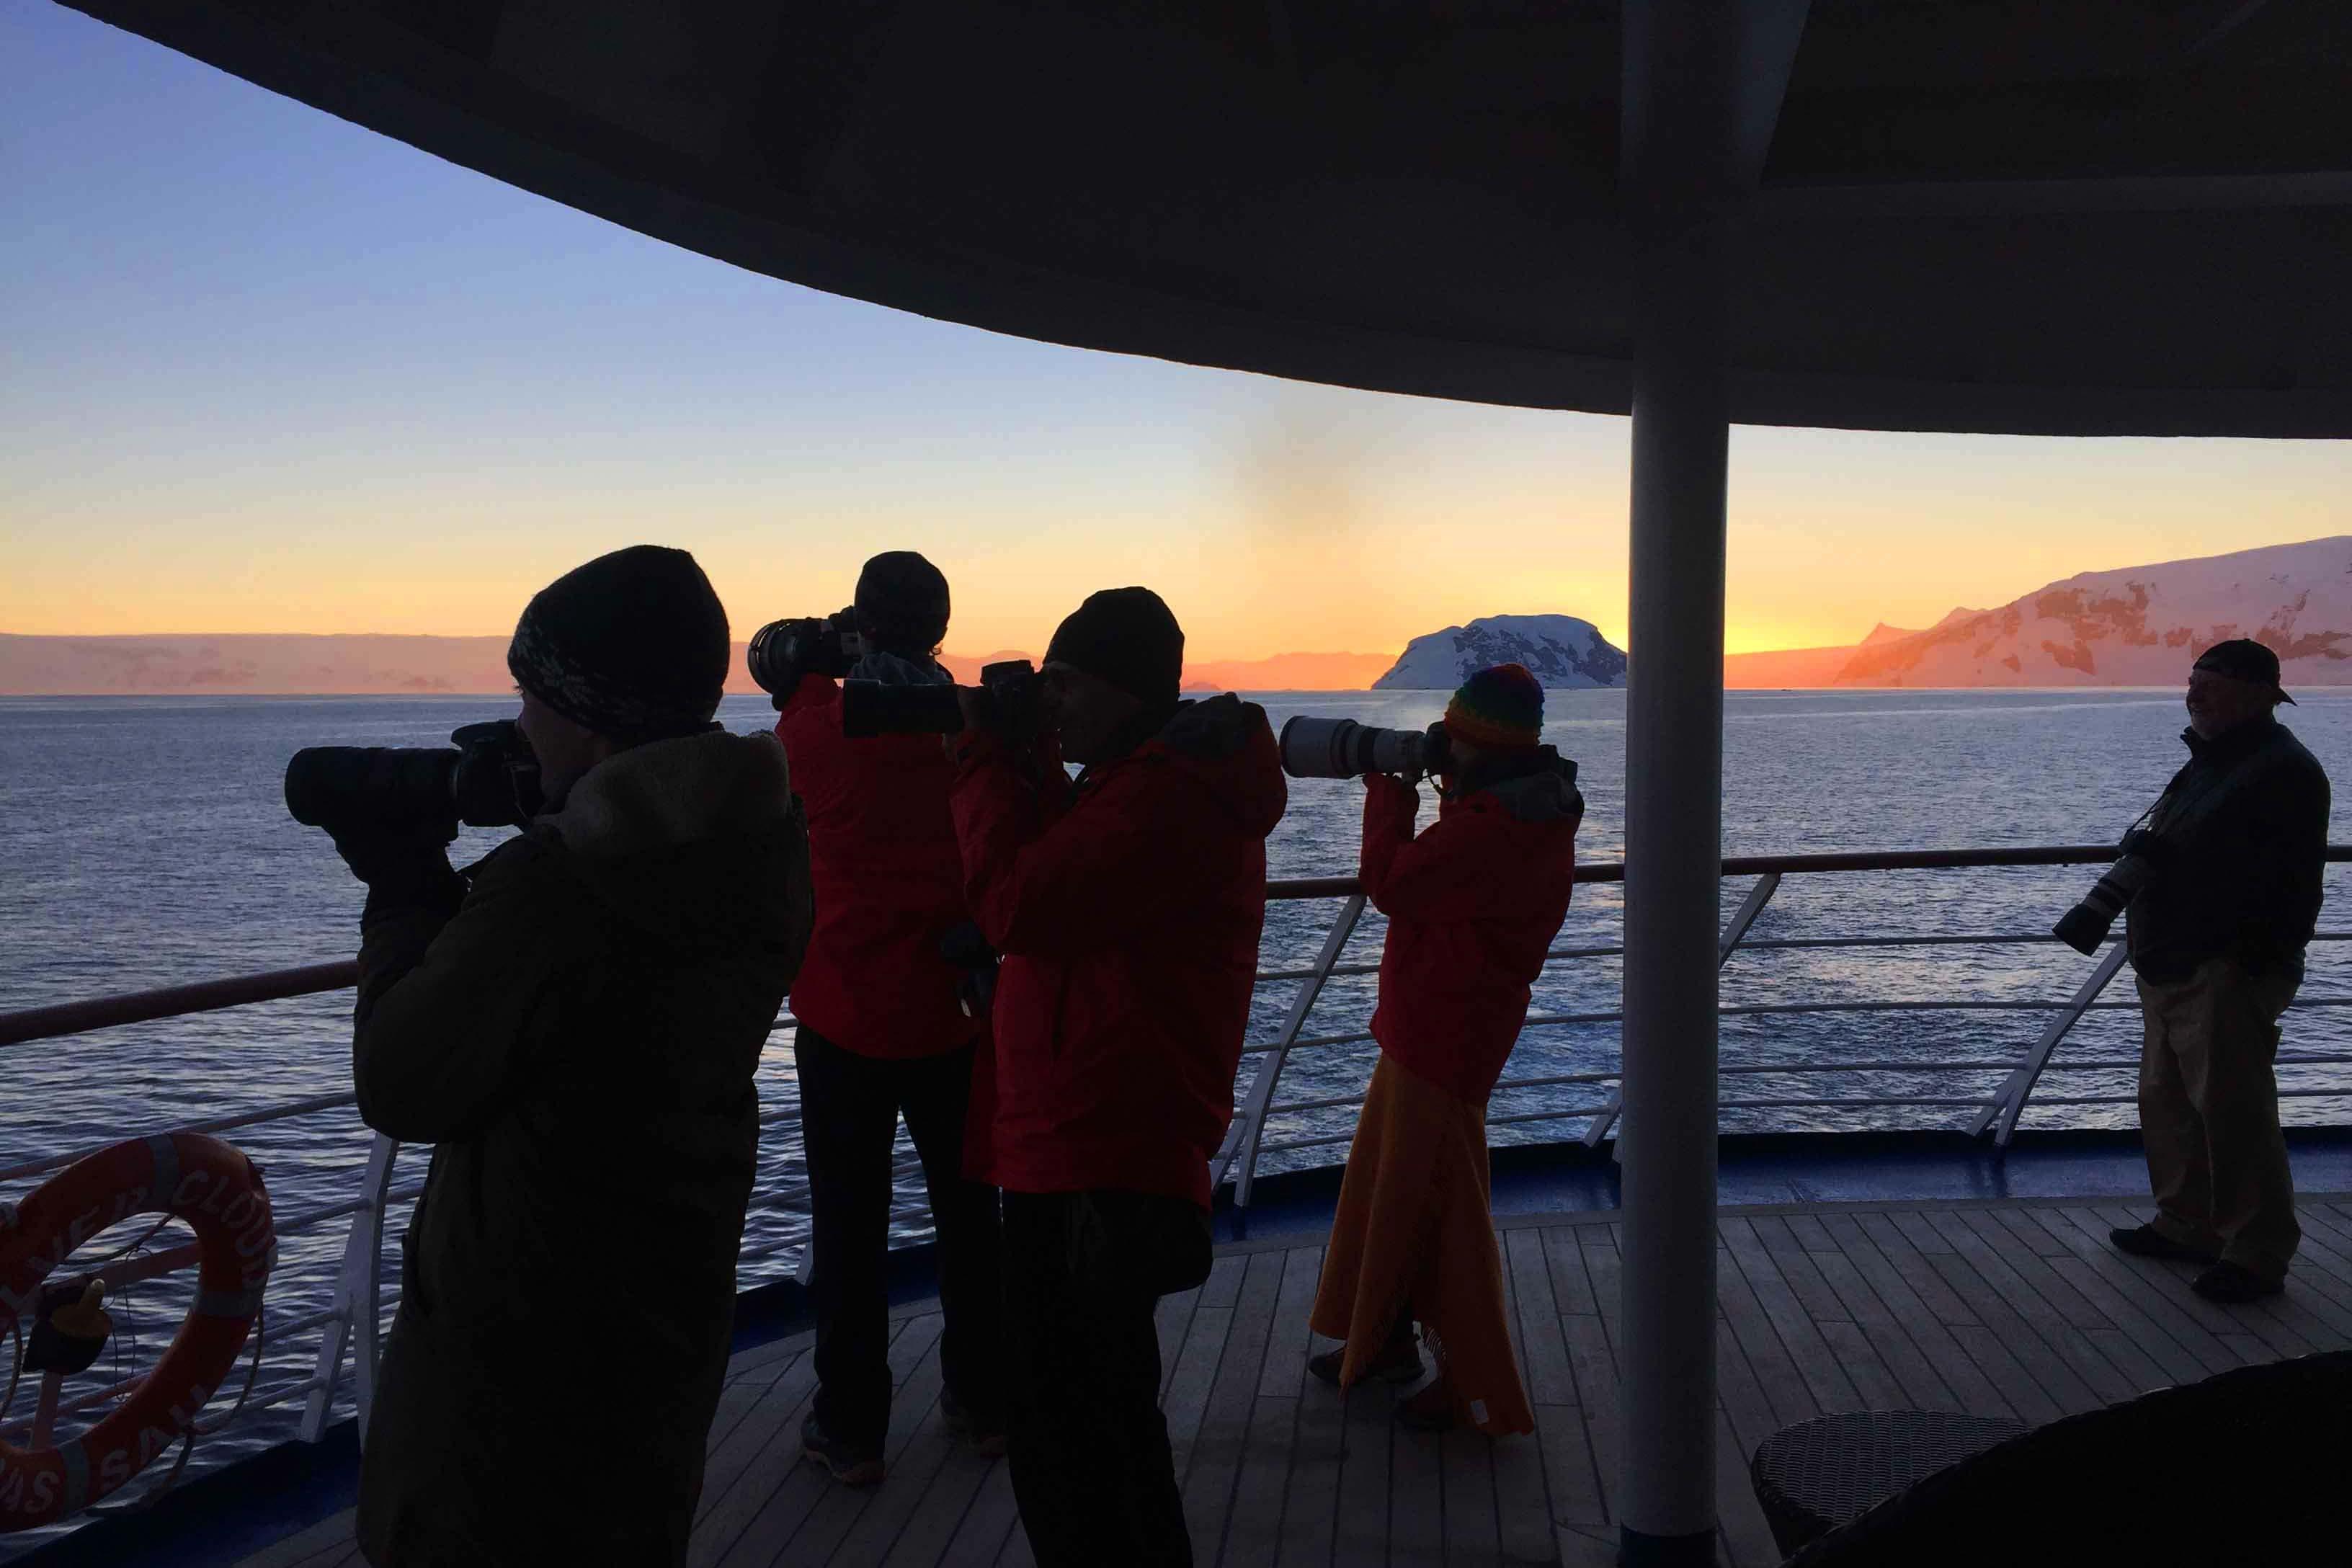 Capturing the sunset during an Antarctica cruise.